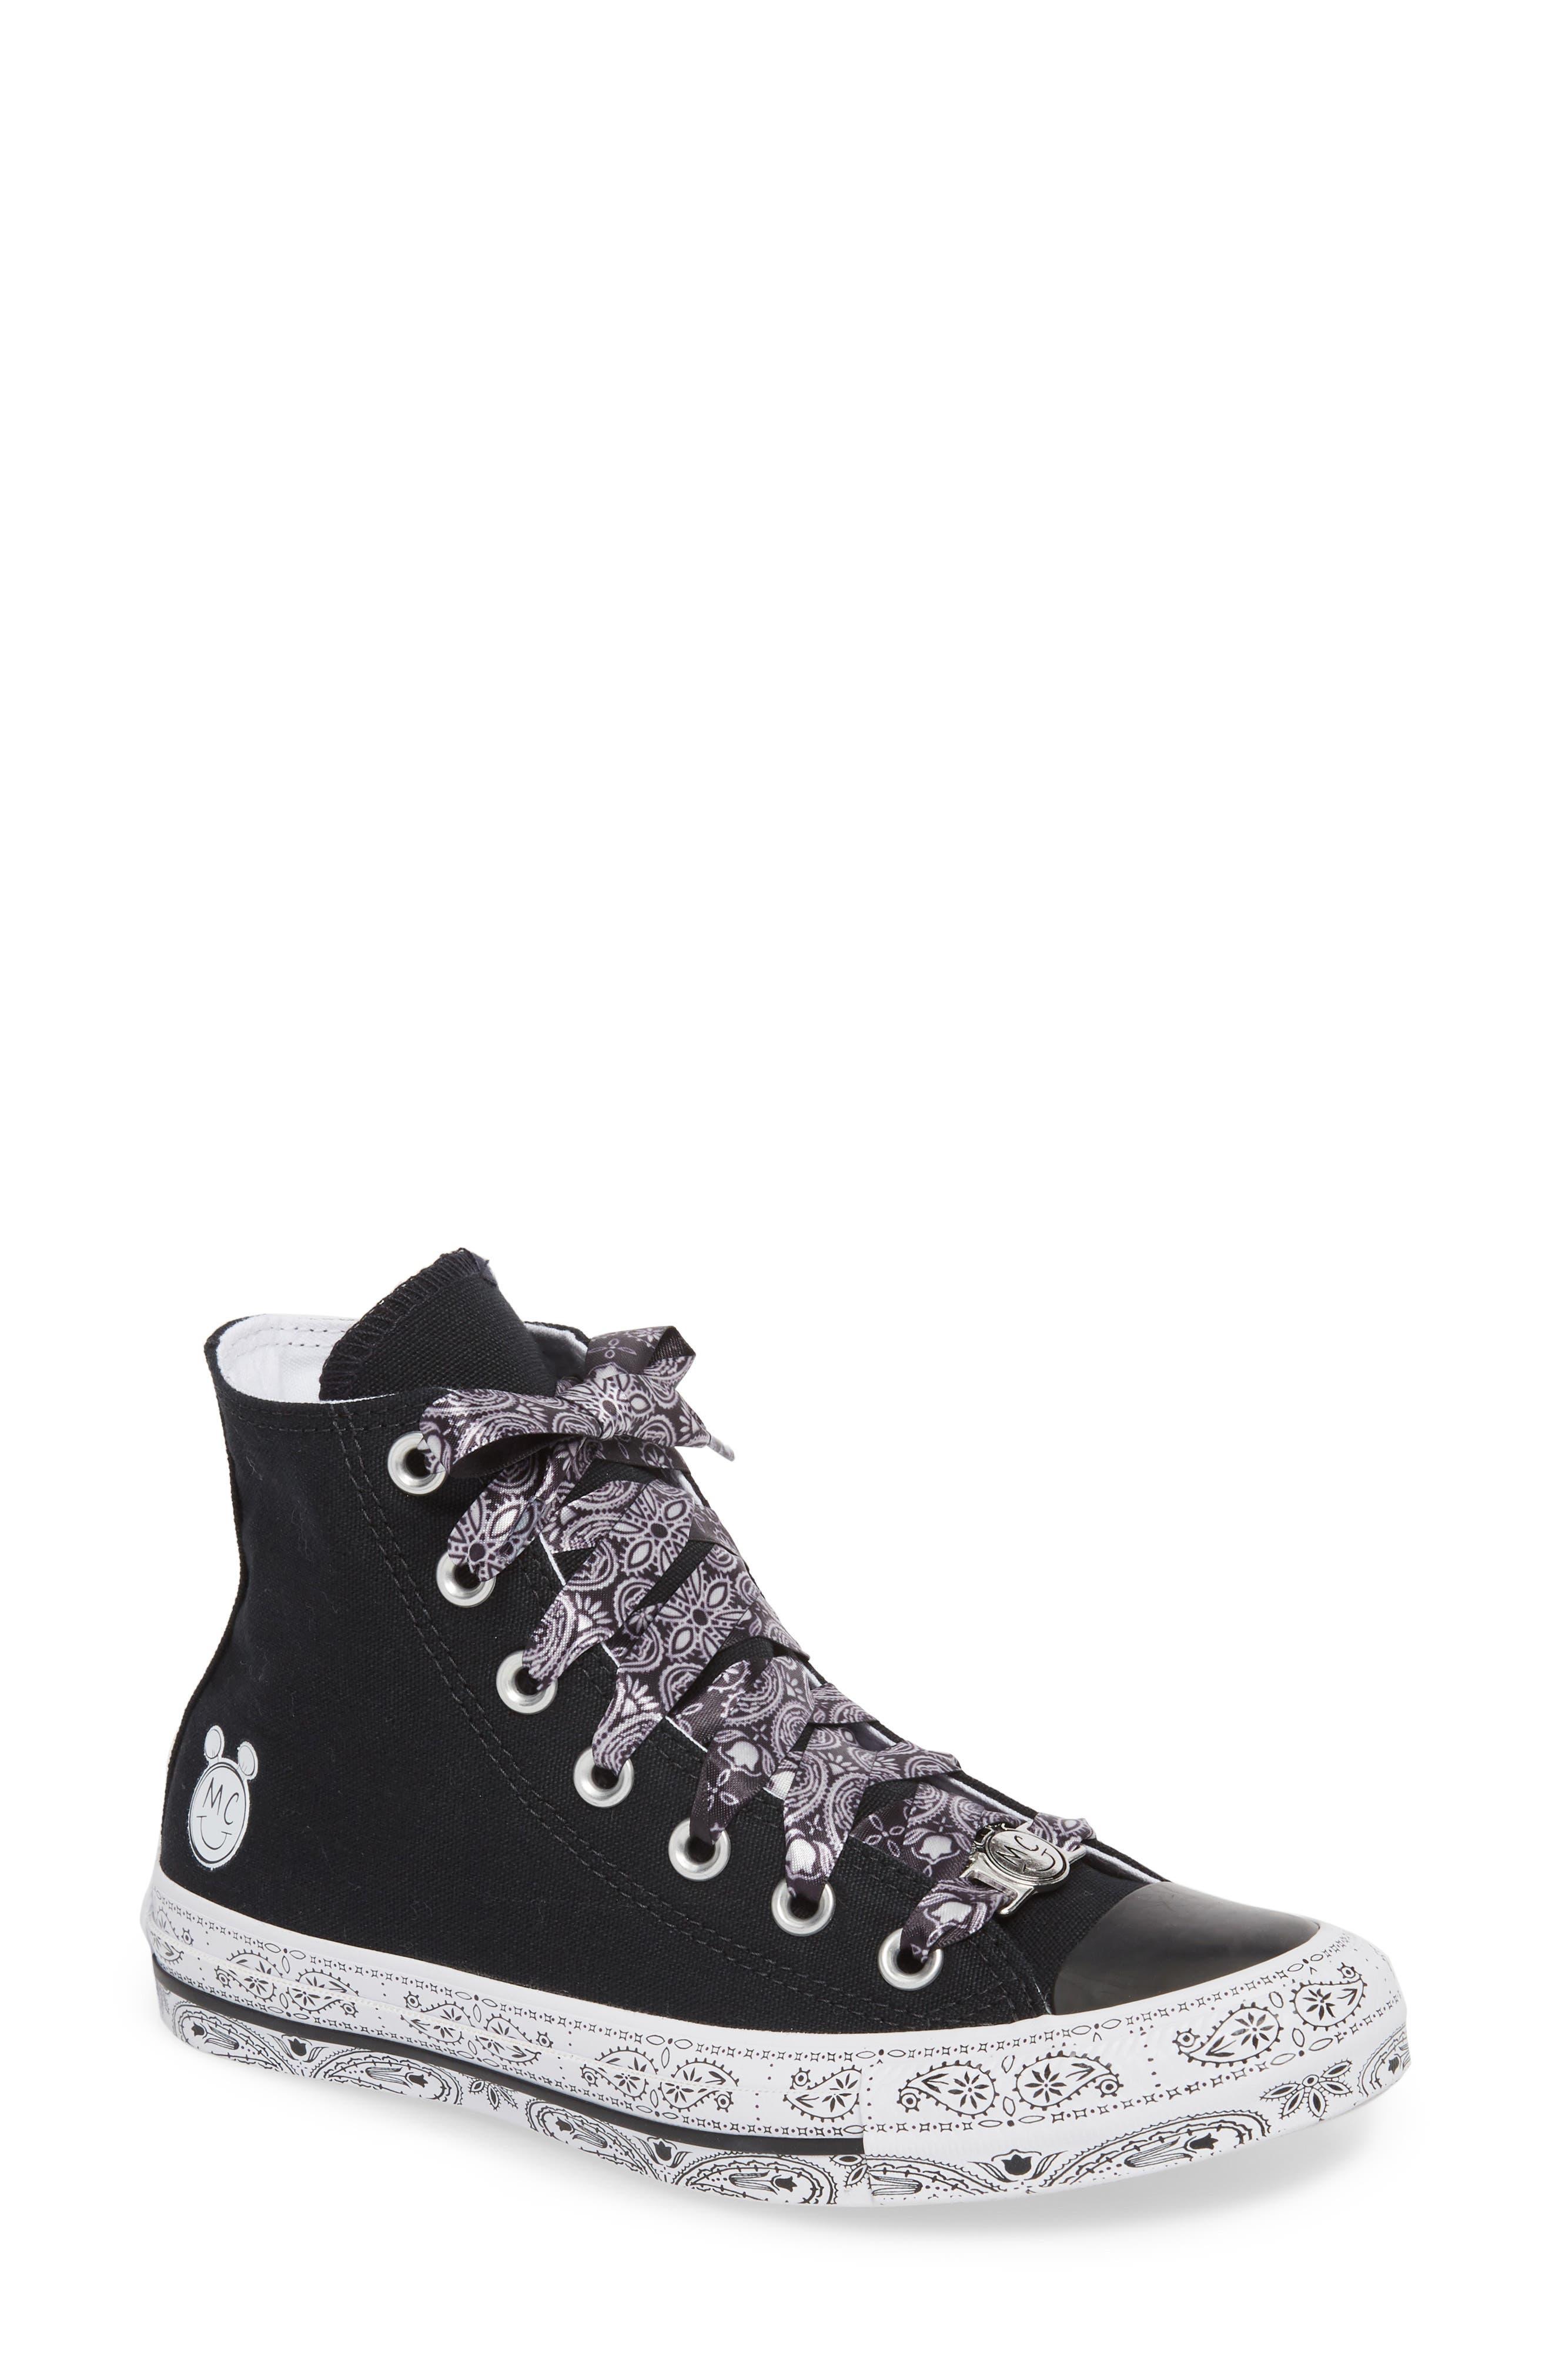 CONVERSE x Miley Cyrus Chuck Taylor All Star Bandana High Top Sneaker, Main, color, 001